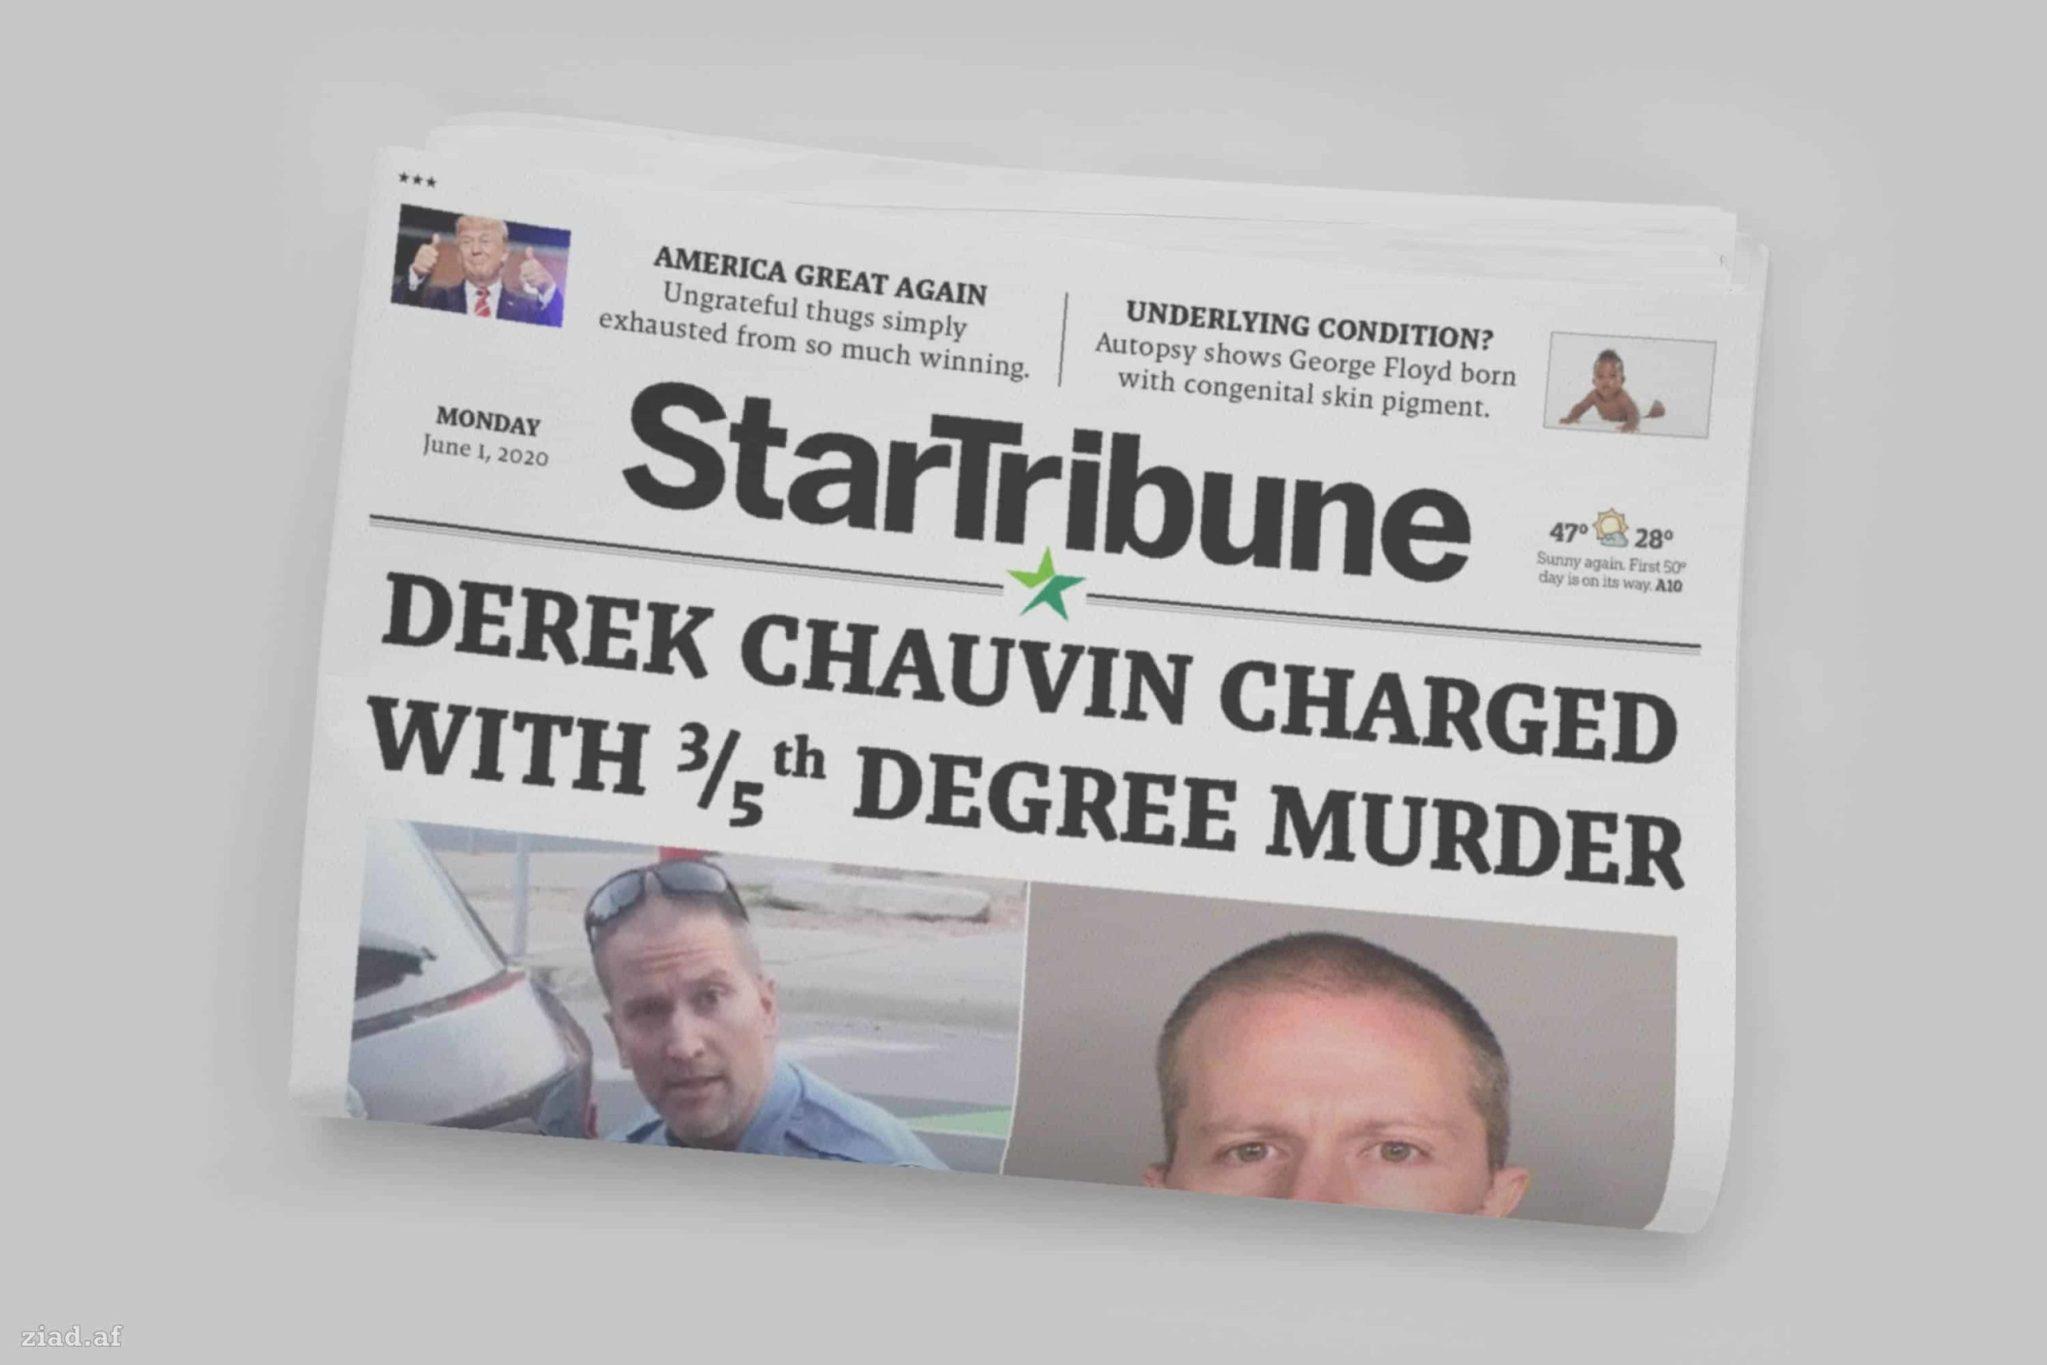 Three-Fifths Degree Murder